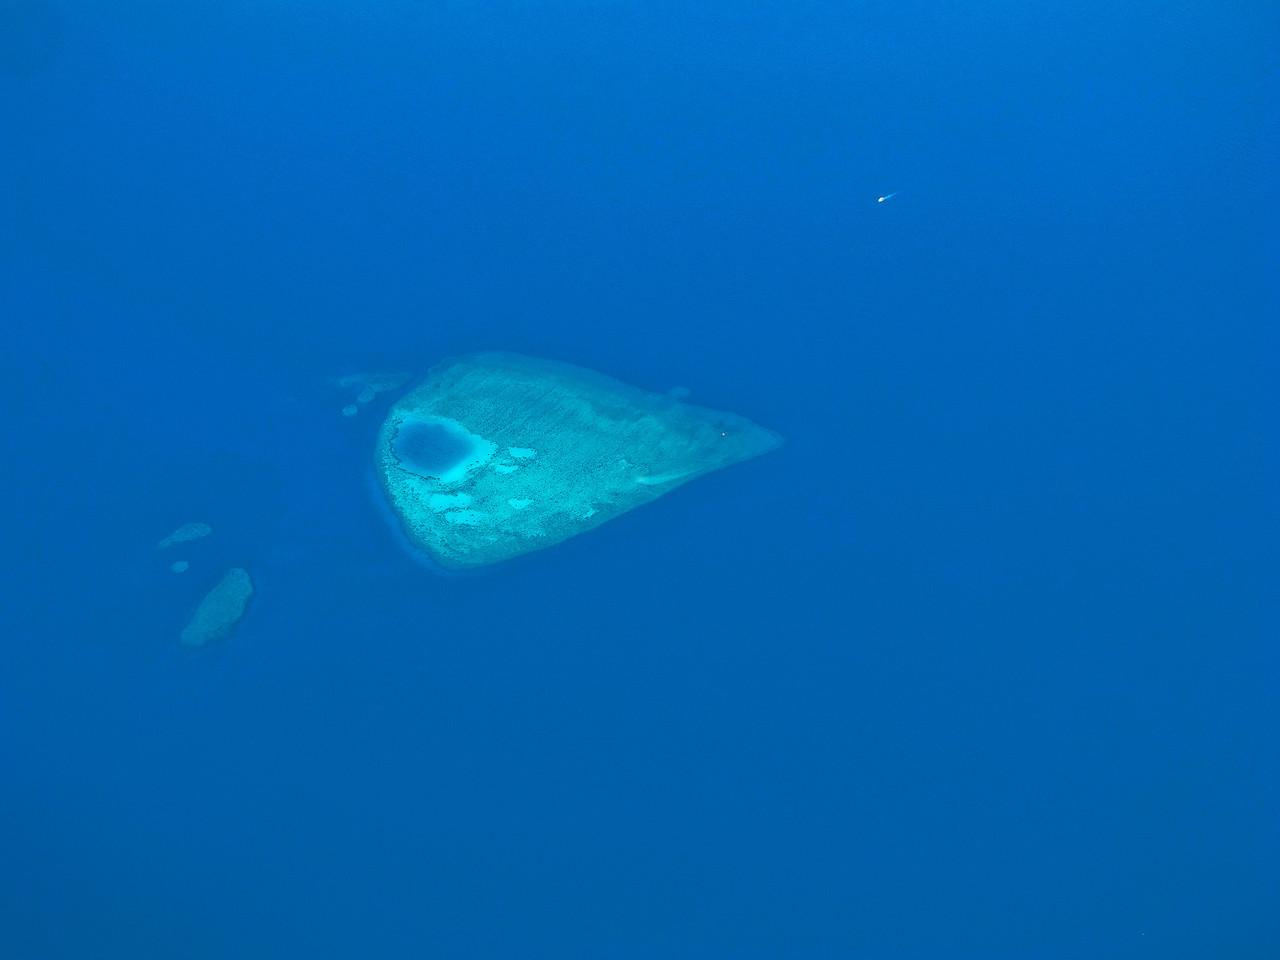 A small island in the Gulf of Aqaba.